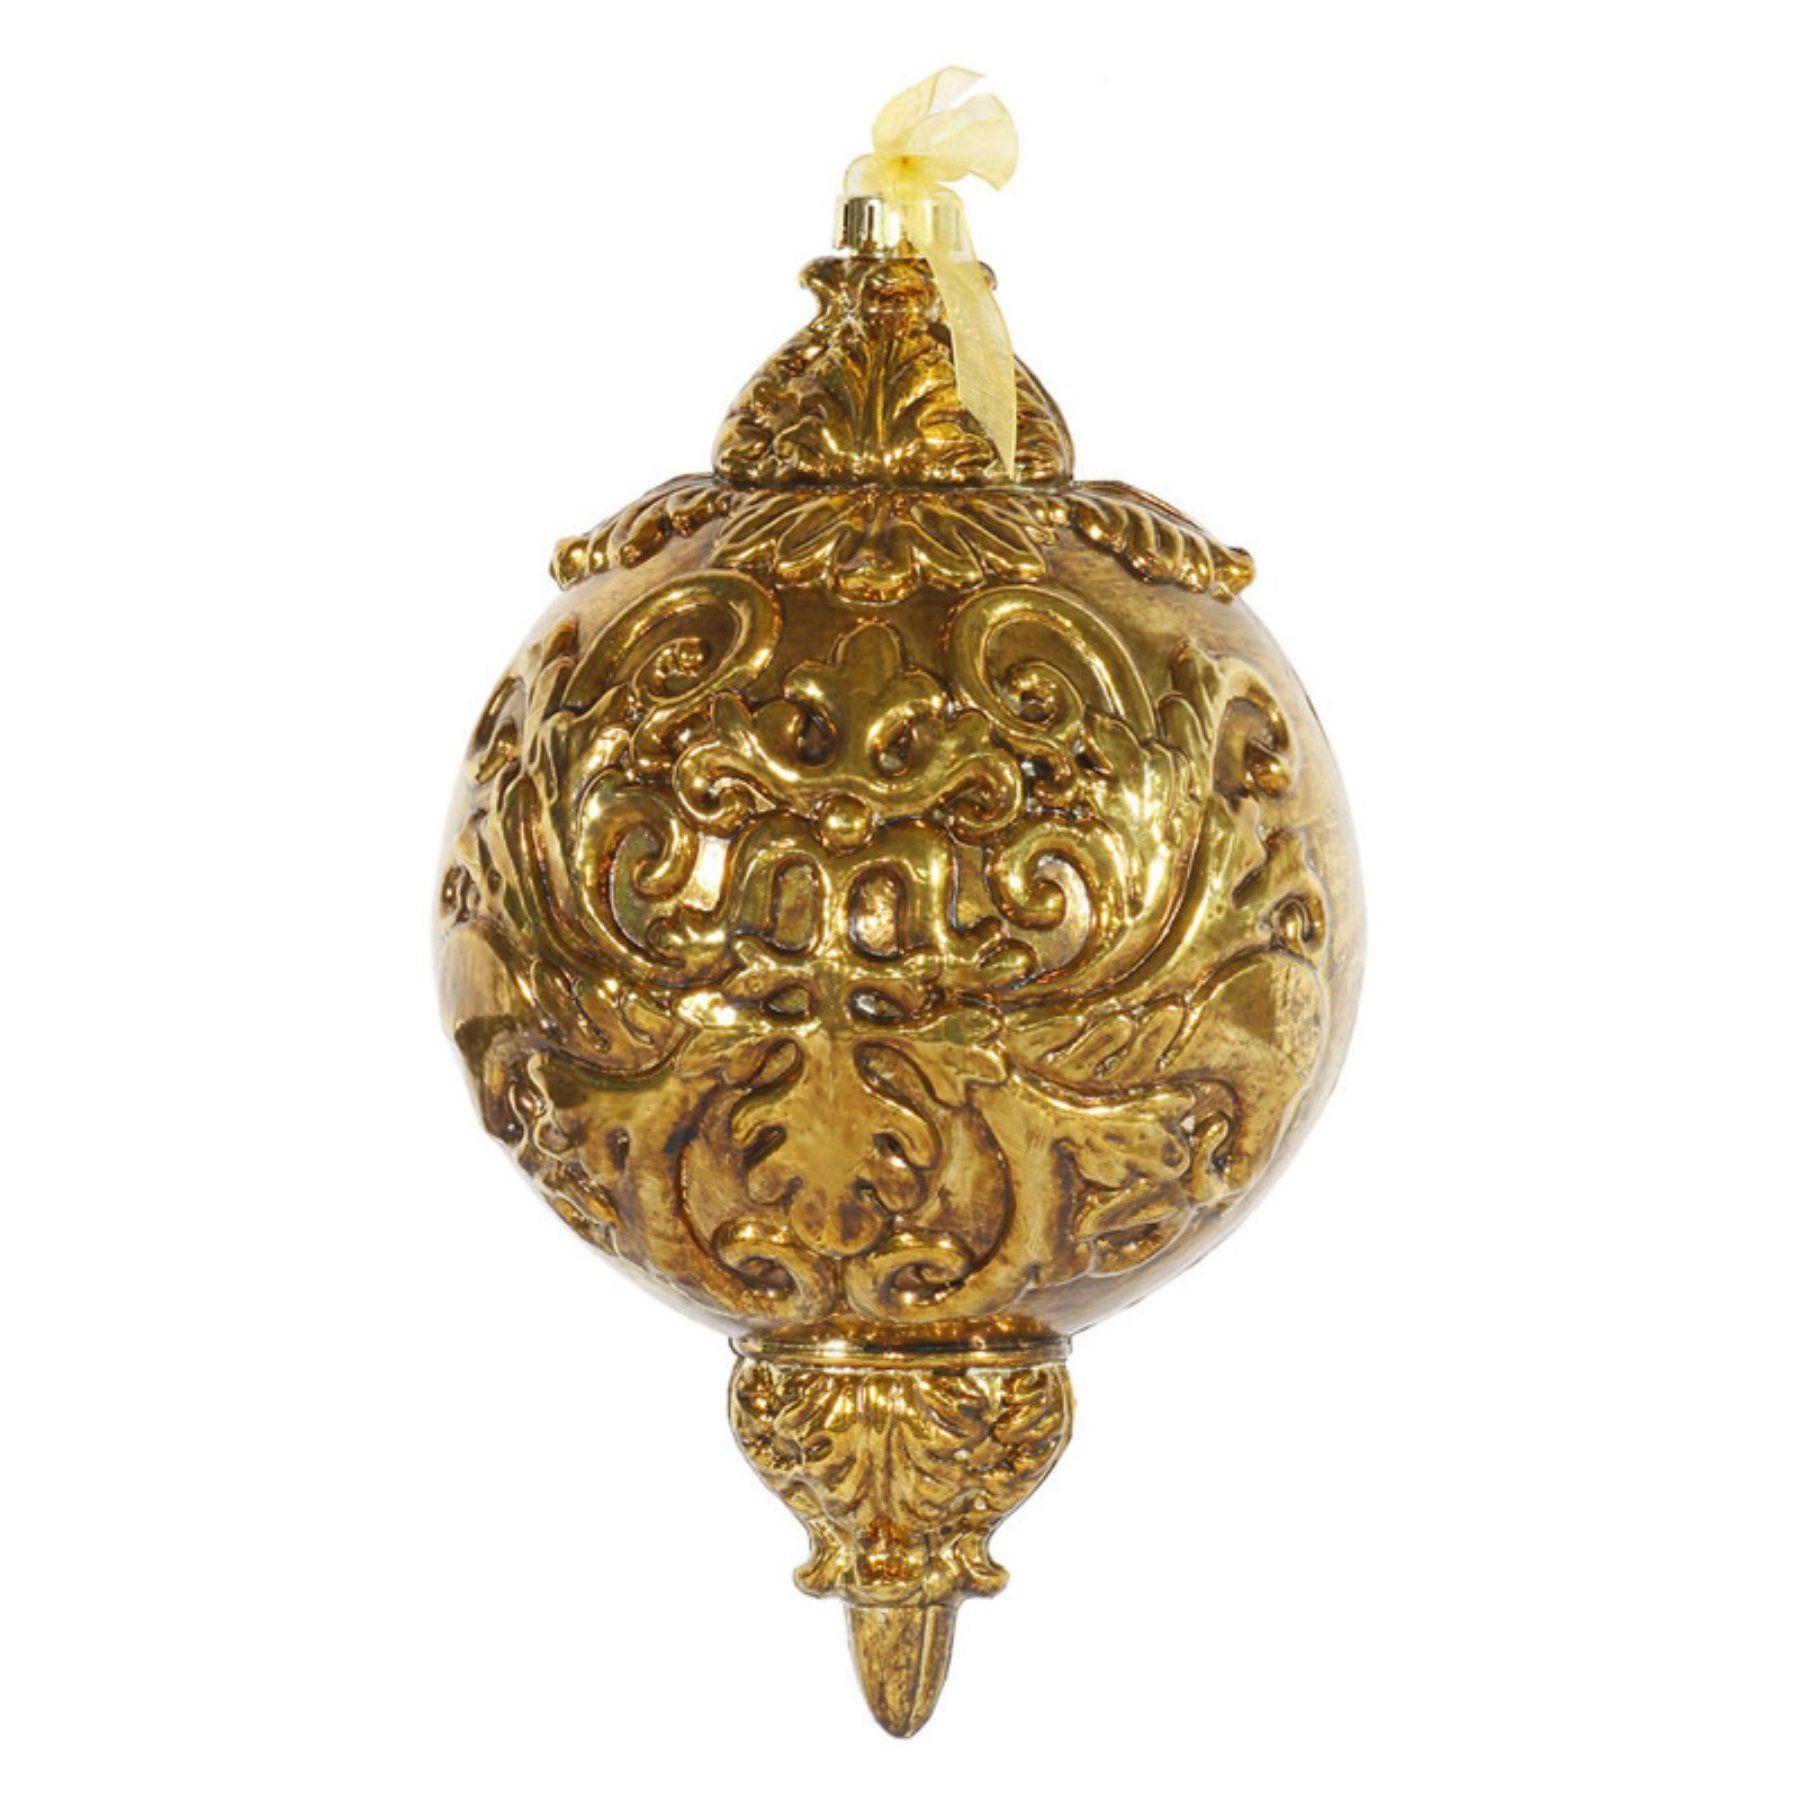 Vickerman 12 Antique Gold Ball Finial Ornament 1 per Box O128019